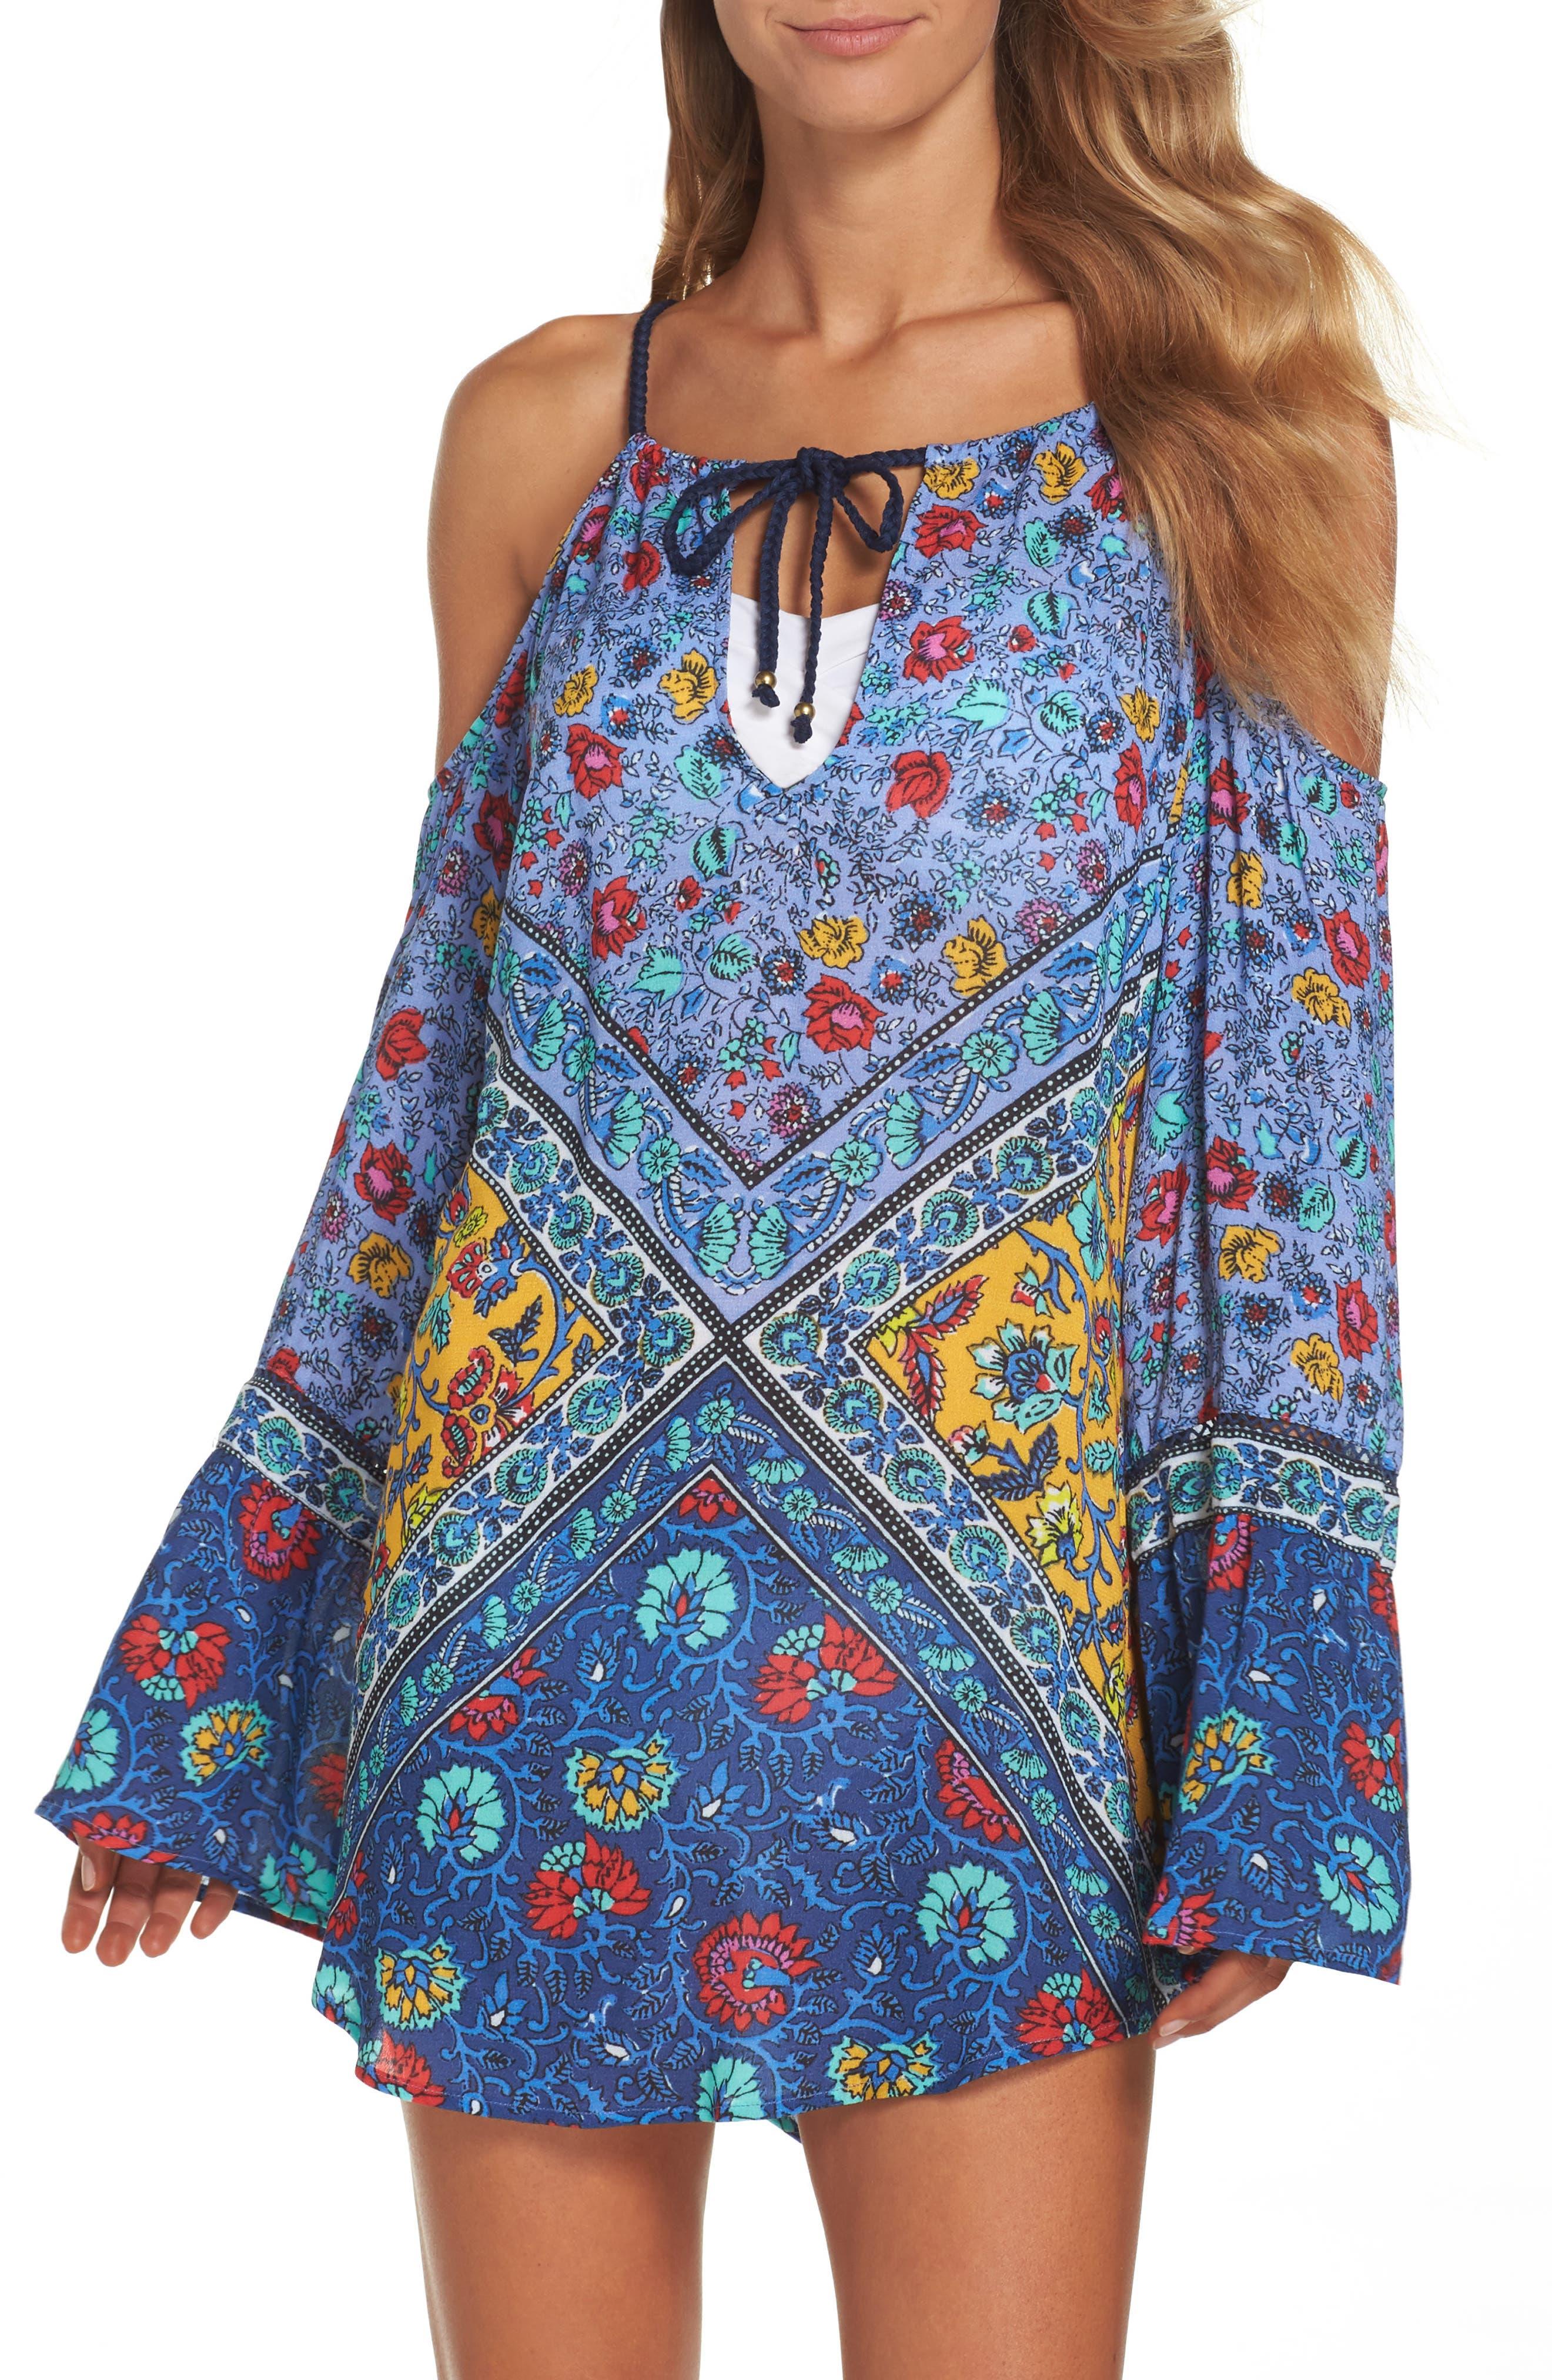 Alternate Image 1 Selected - Nanette Lepore Woodstock Cold Shoulder Cover-Up Tunic